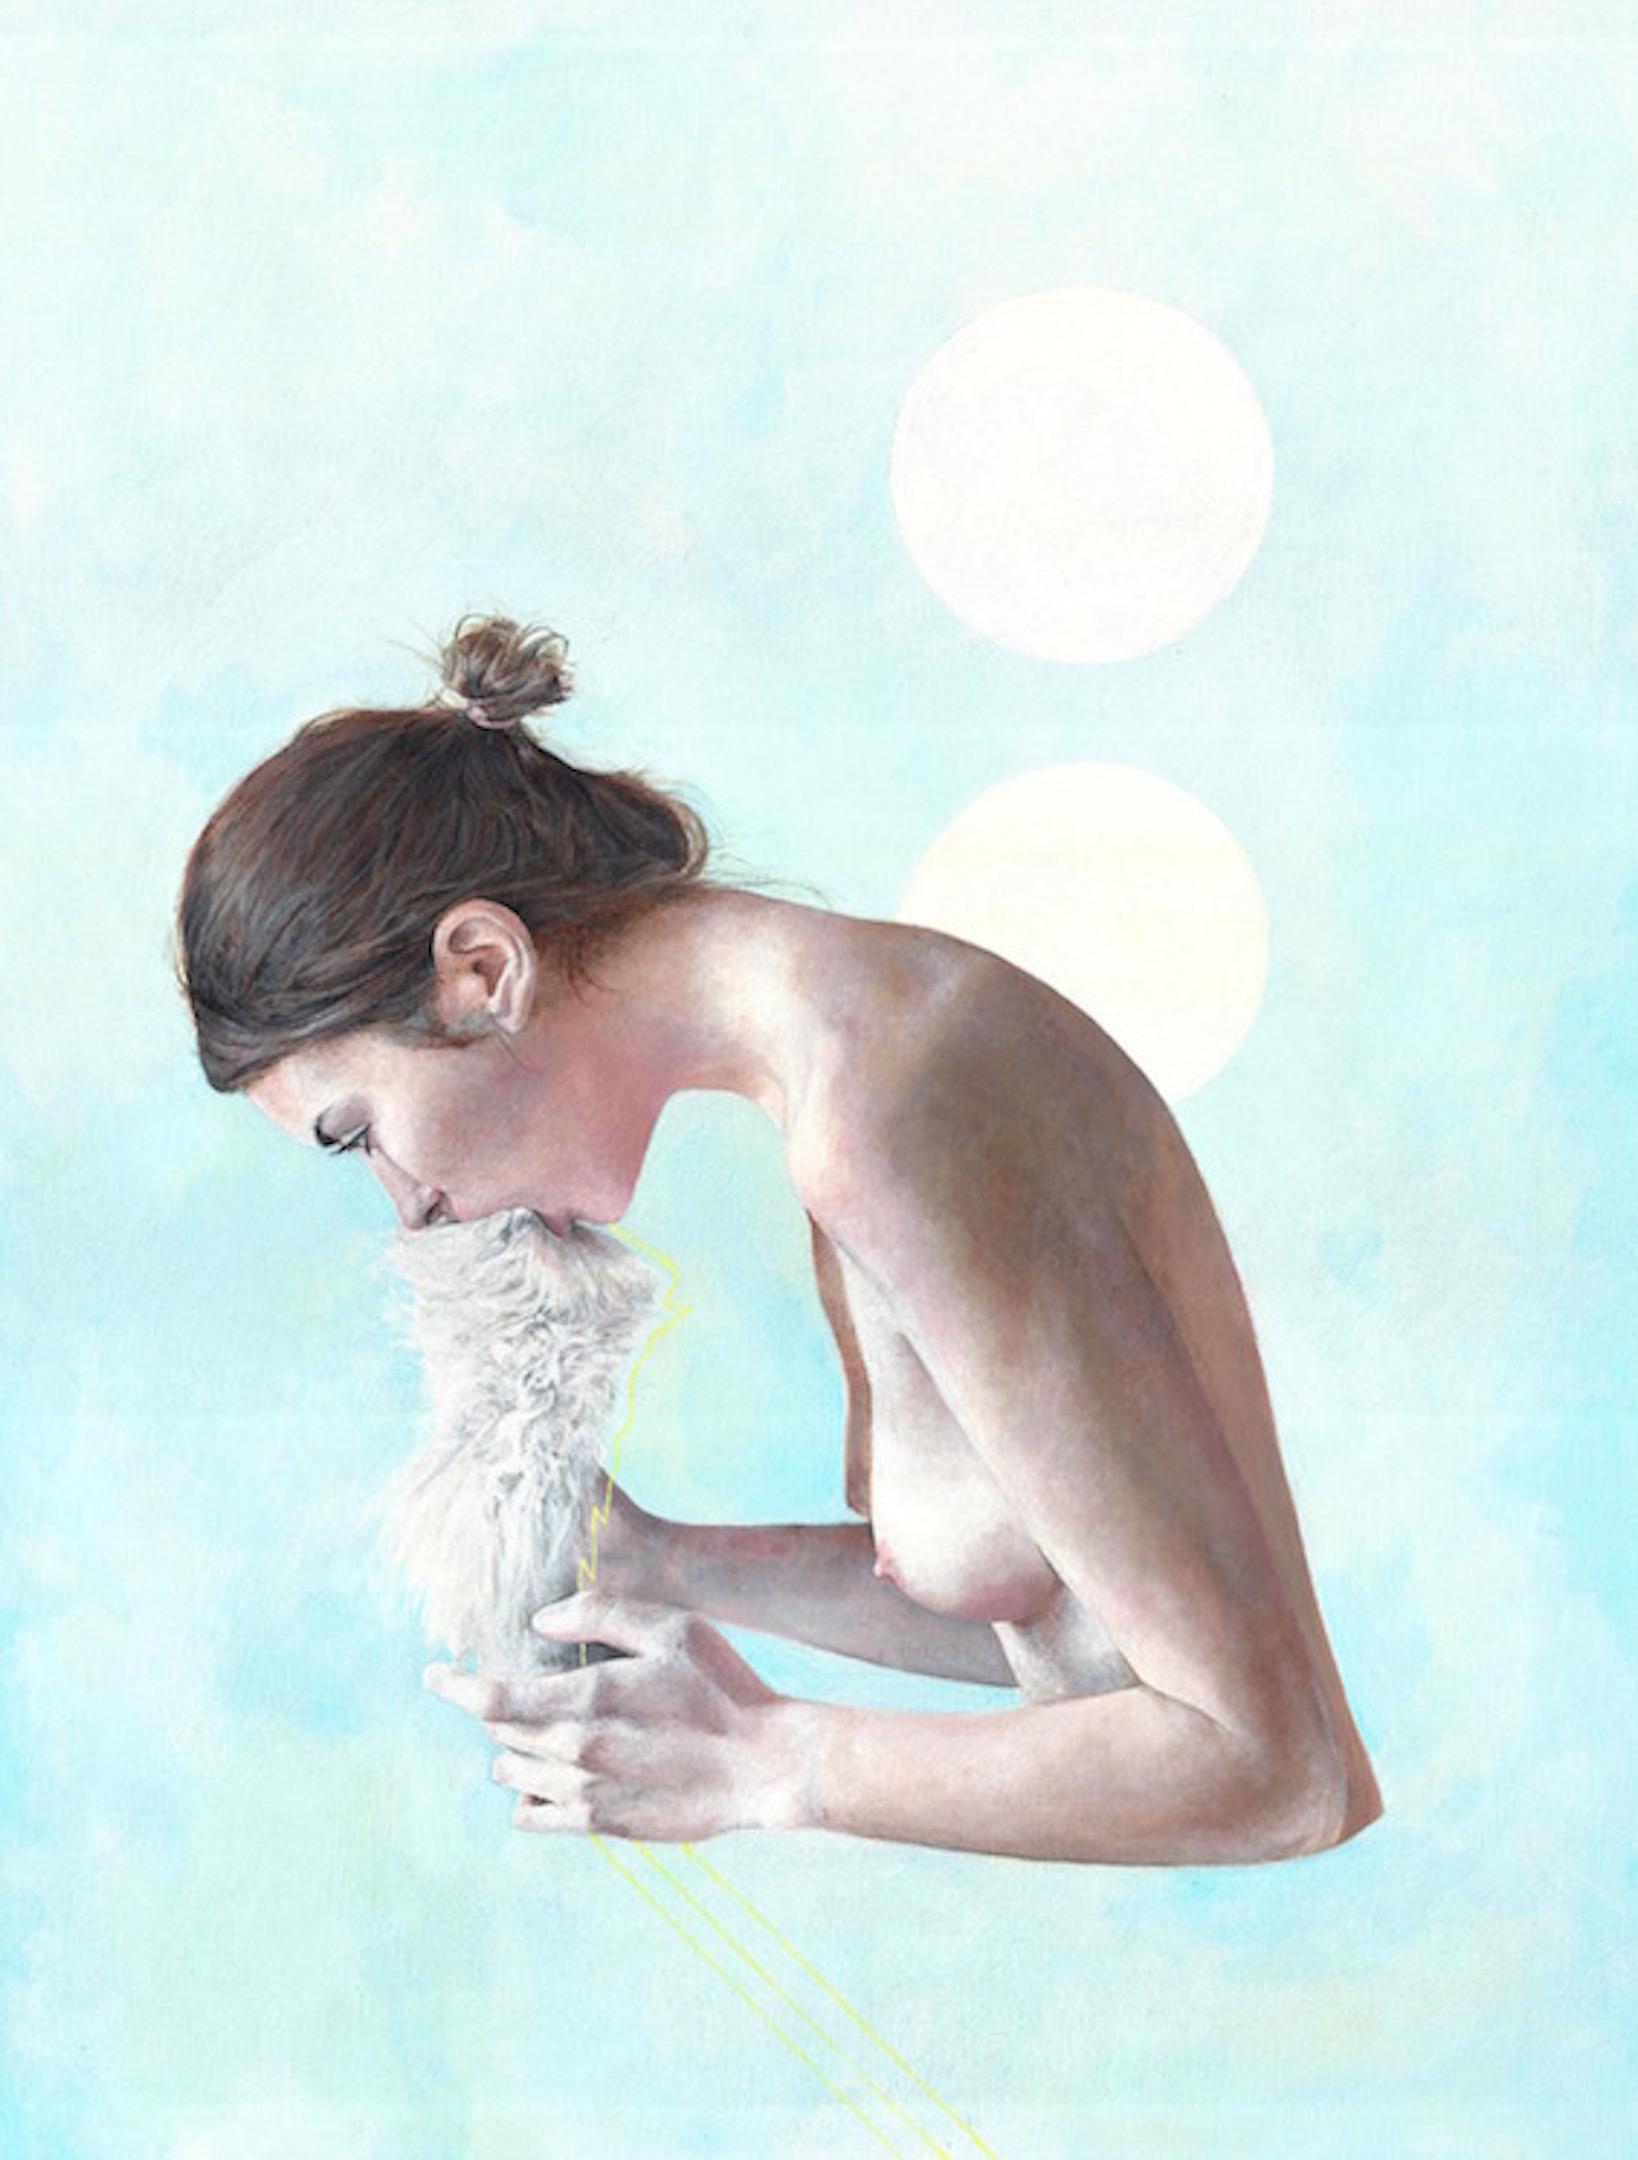 GF-008 I am Choking, 2015, acrylic on paper, 19.25x25.25, $2000